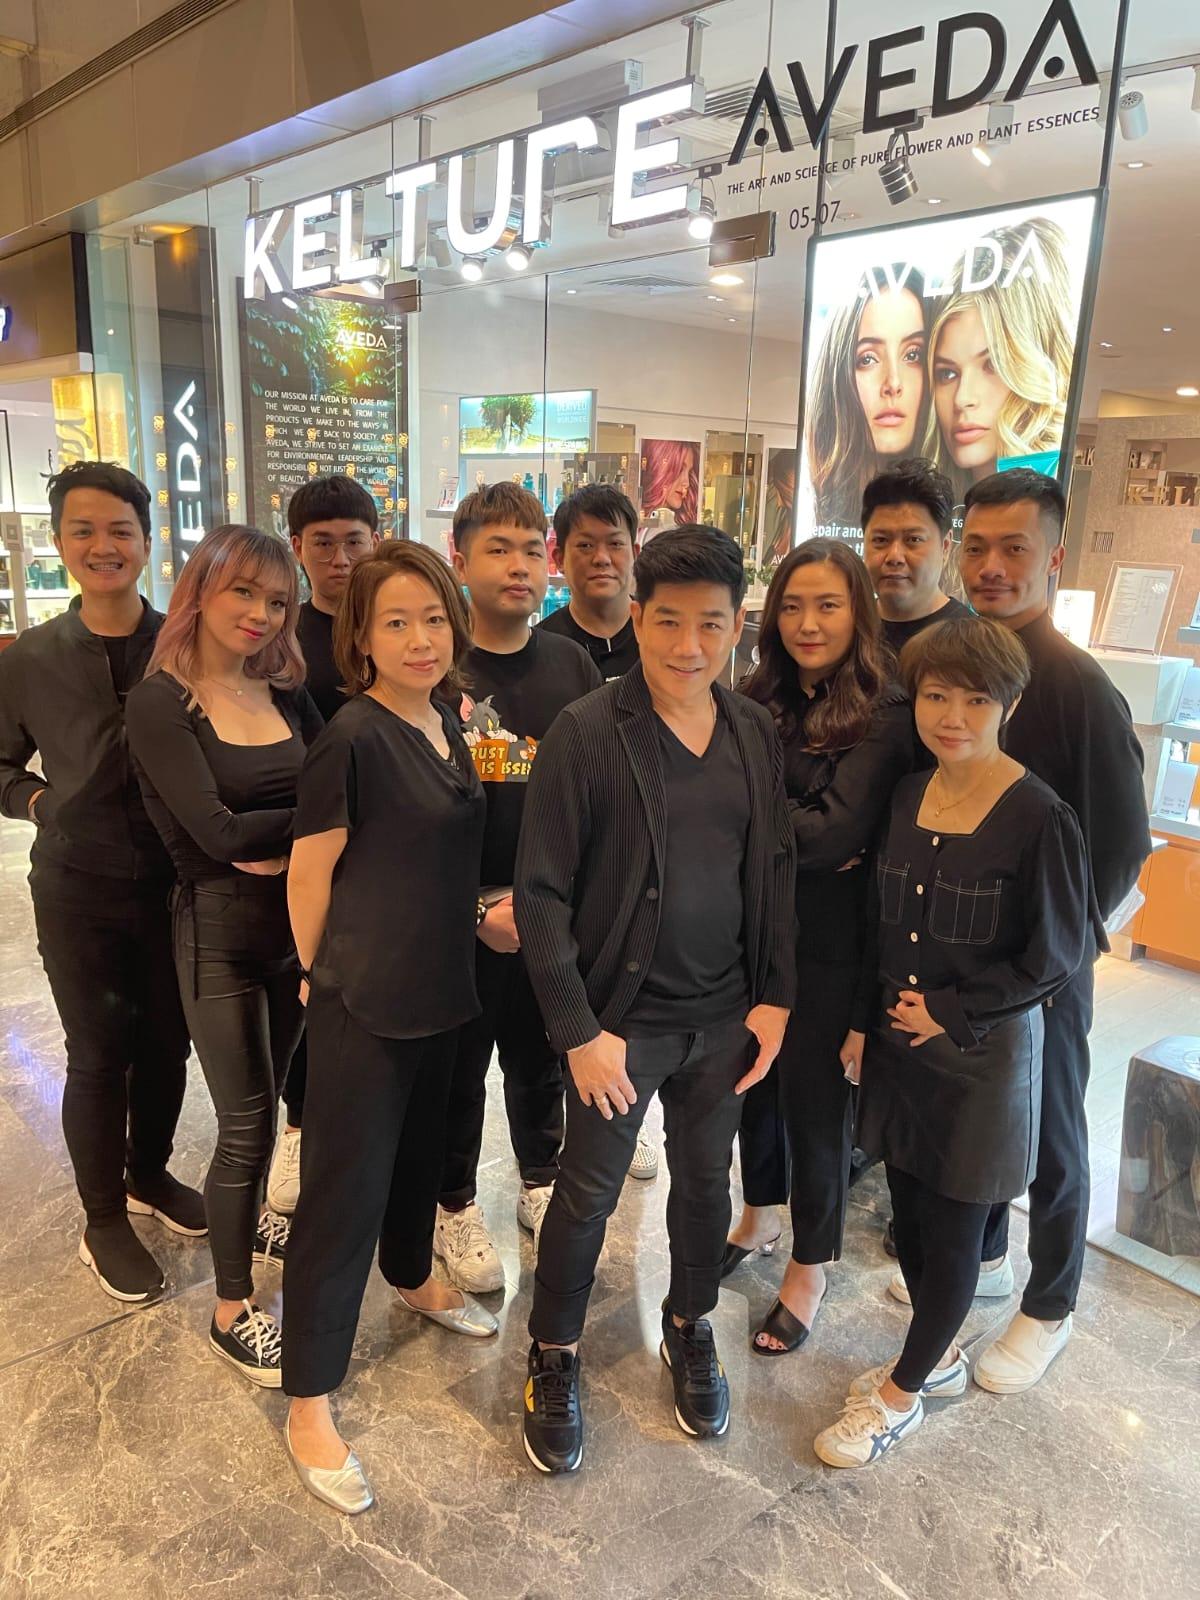 Why Kelture Aveda Hair Salon? 1